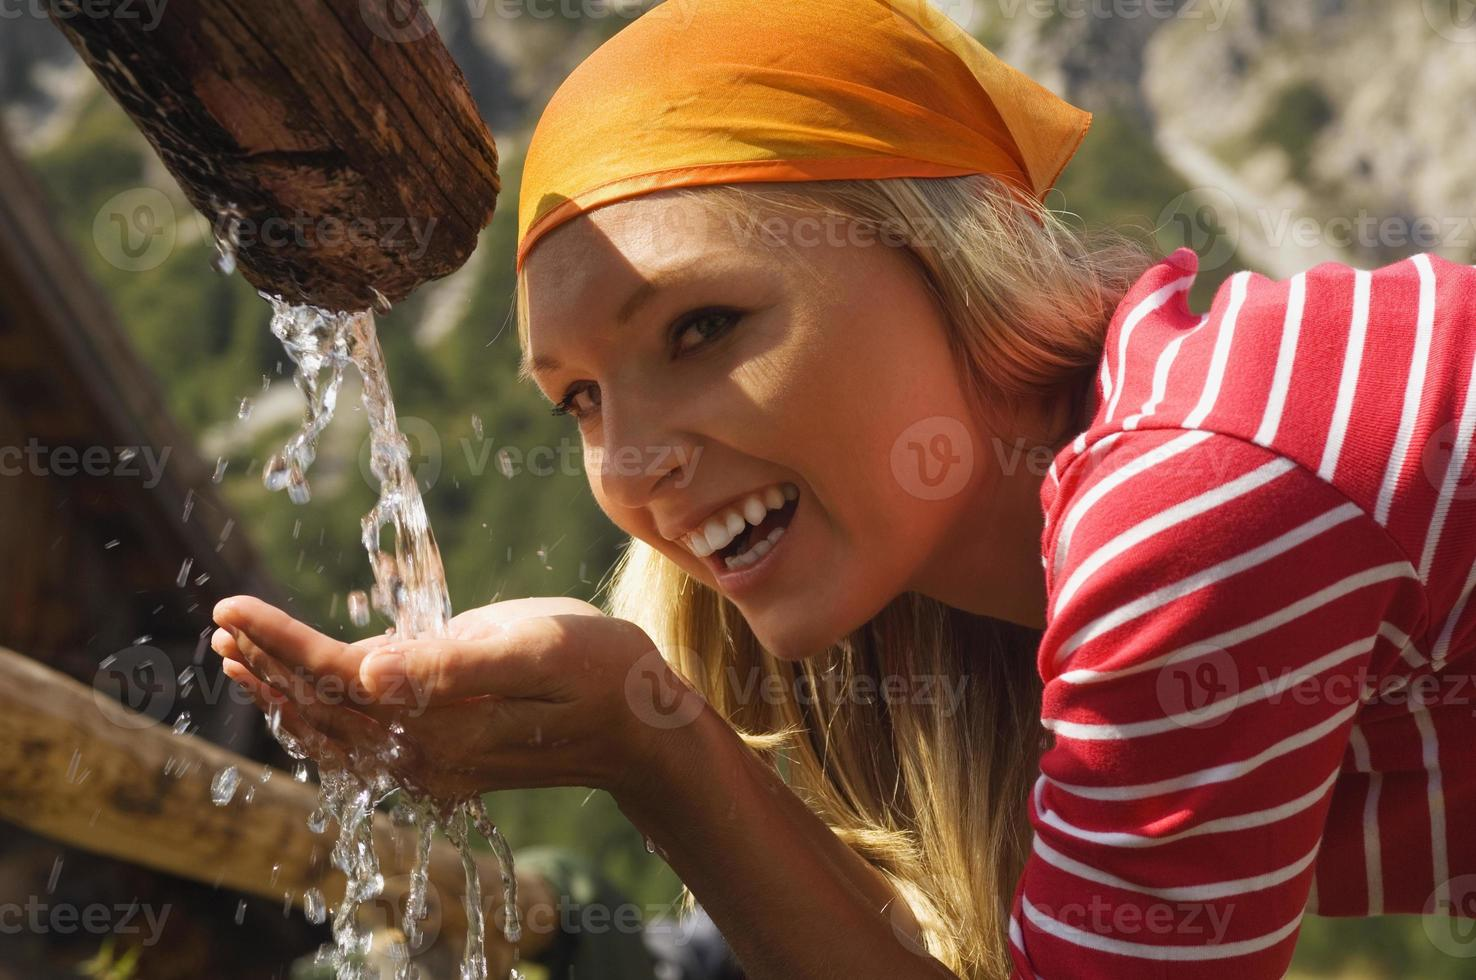 Blonde woman drinking water, portrait photo